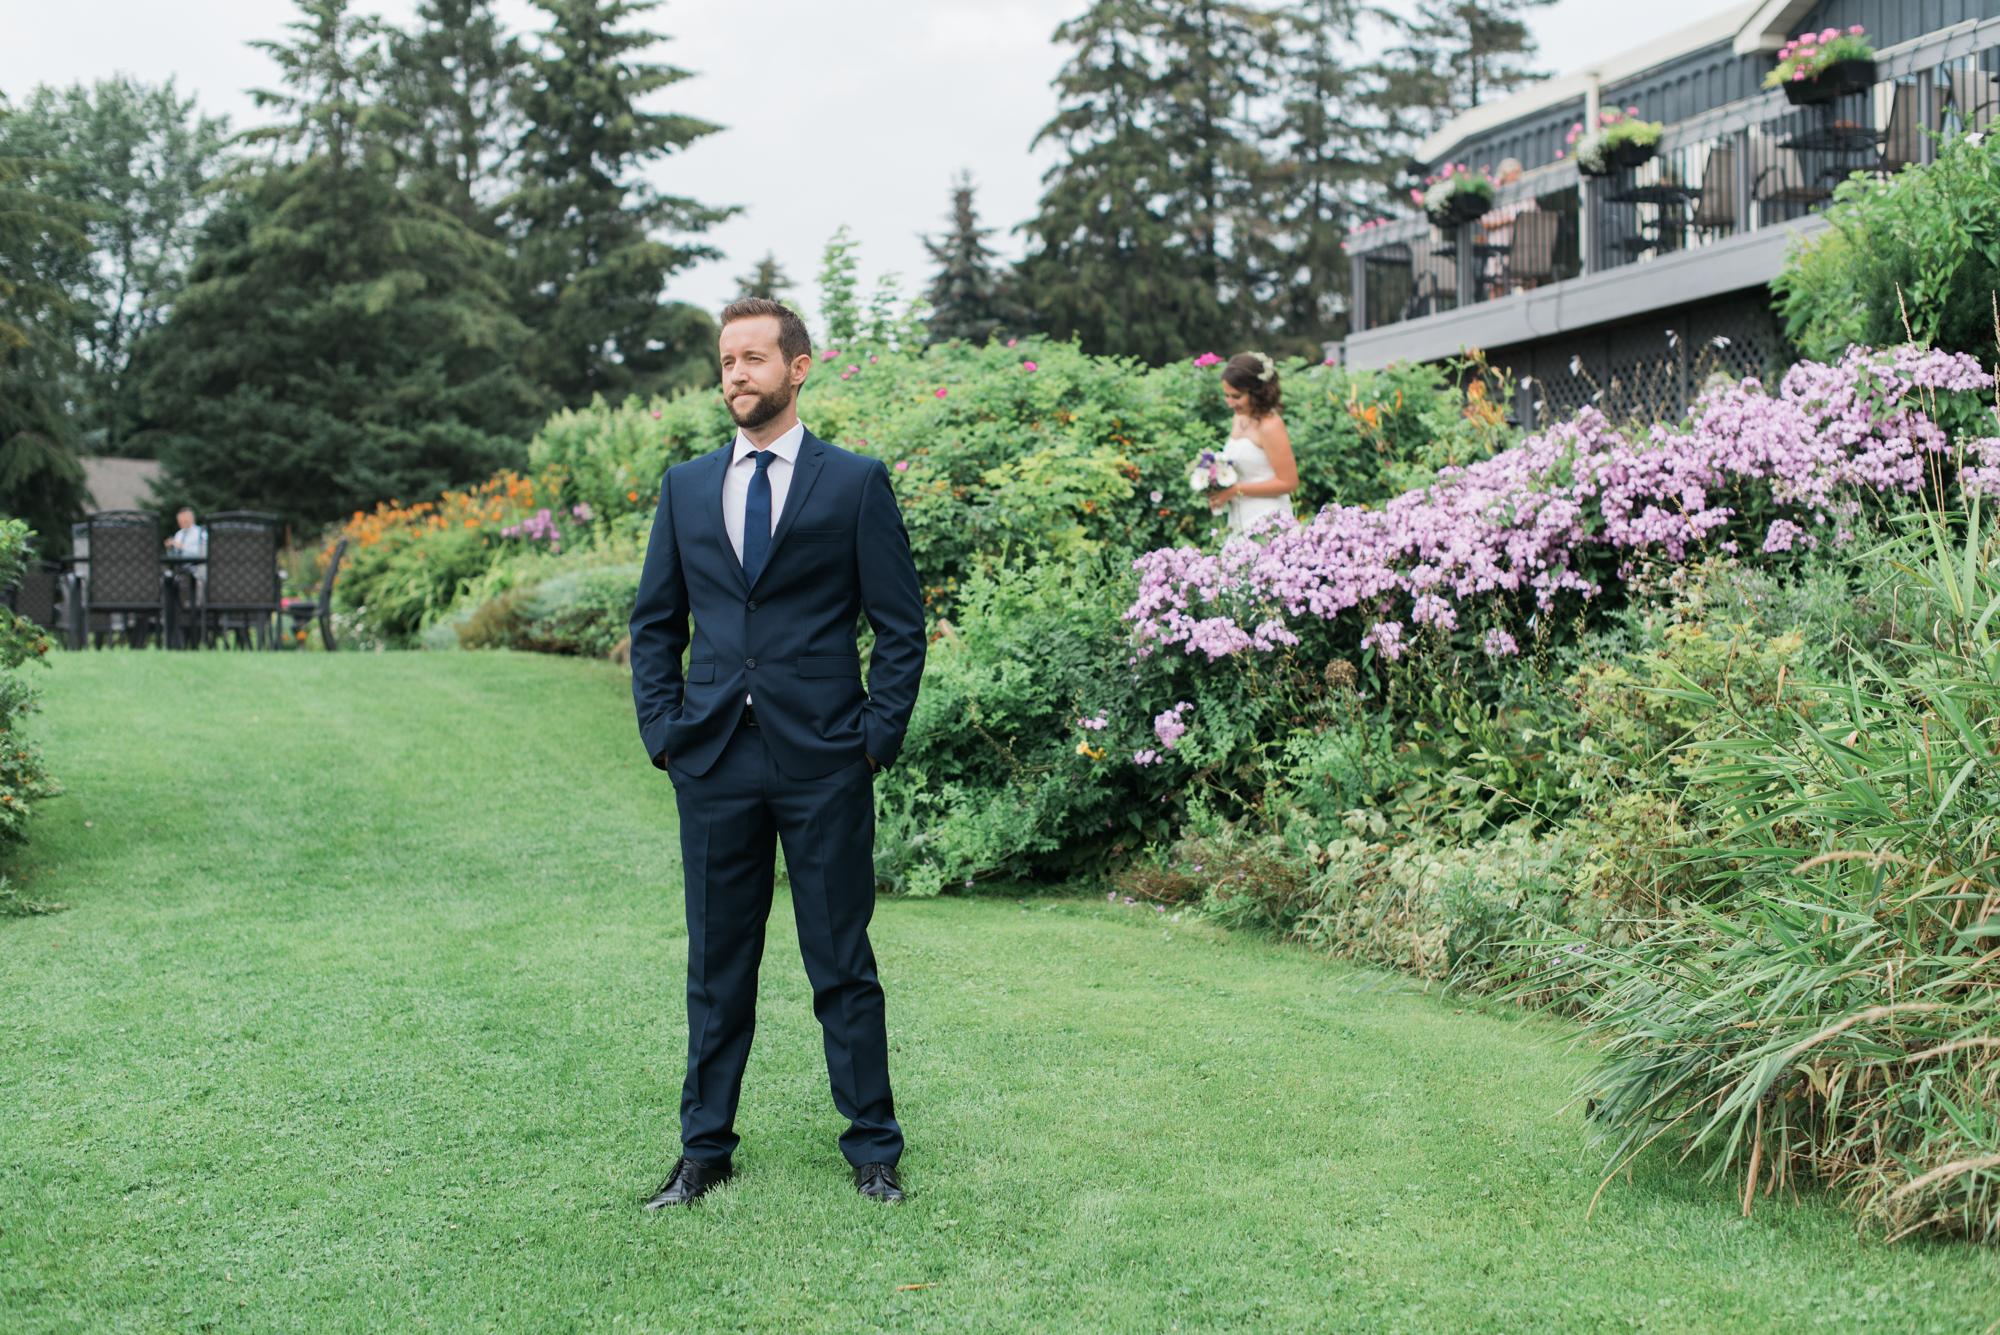 oakview-terrace-wedding-13.jpg